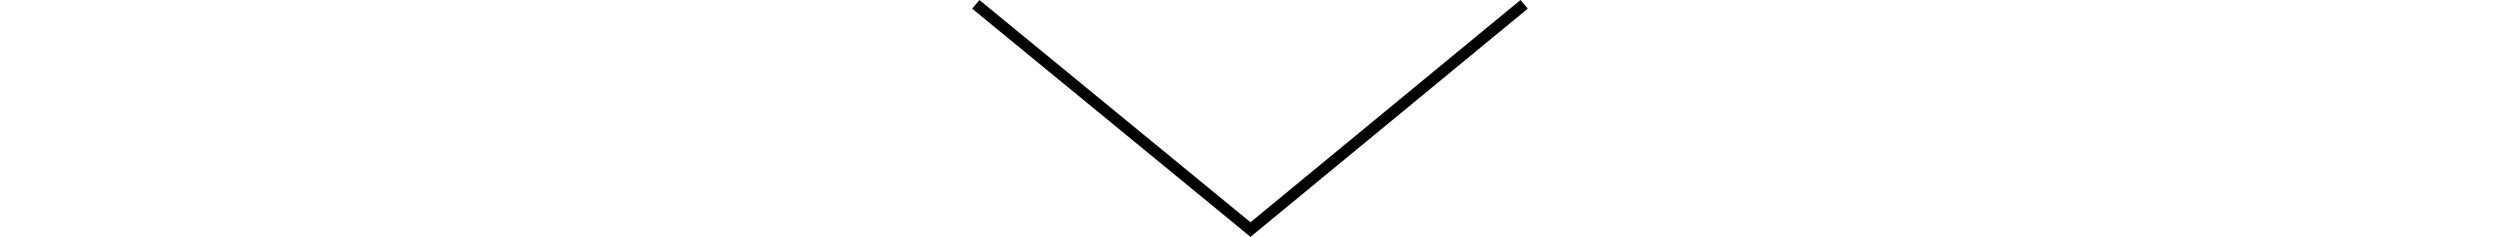 Arrow2.jpg